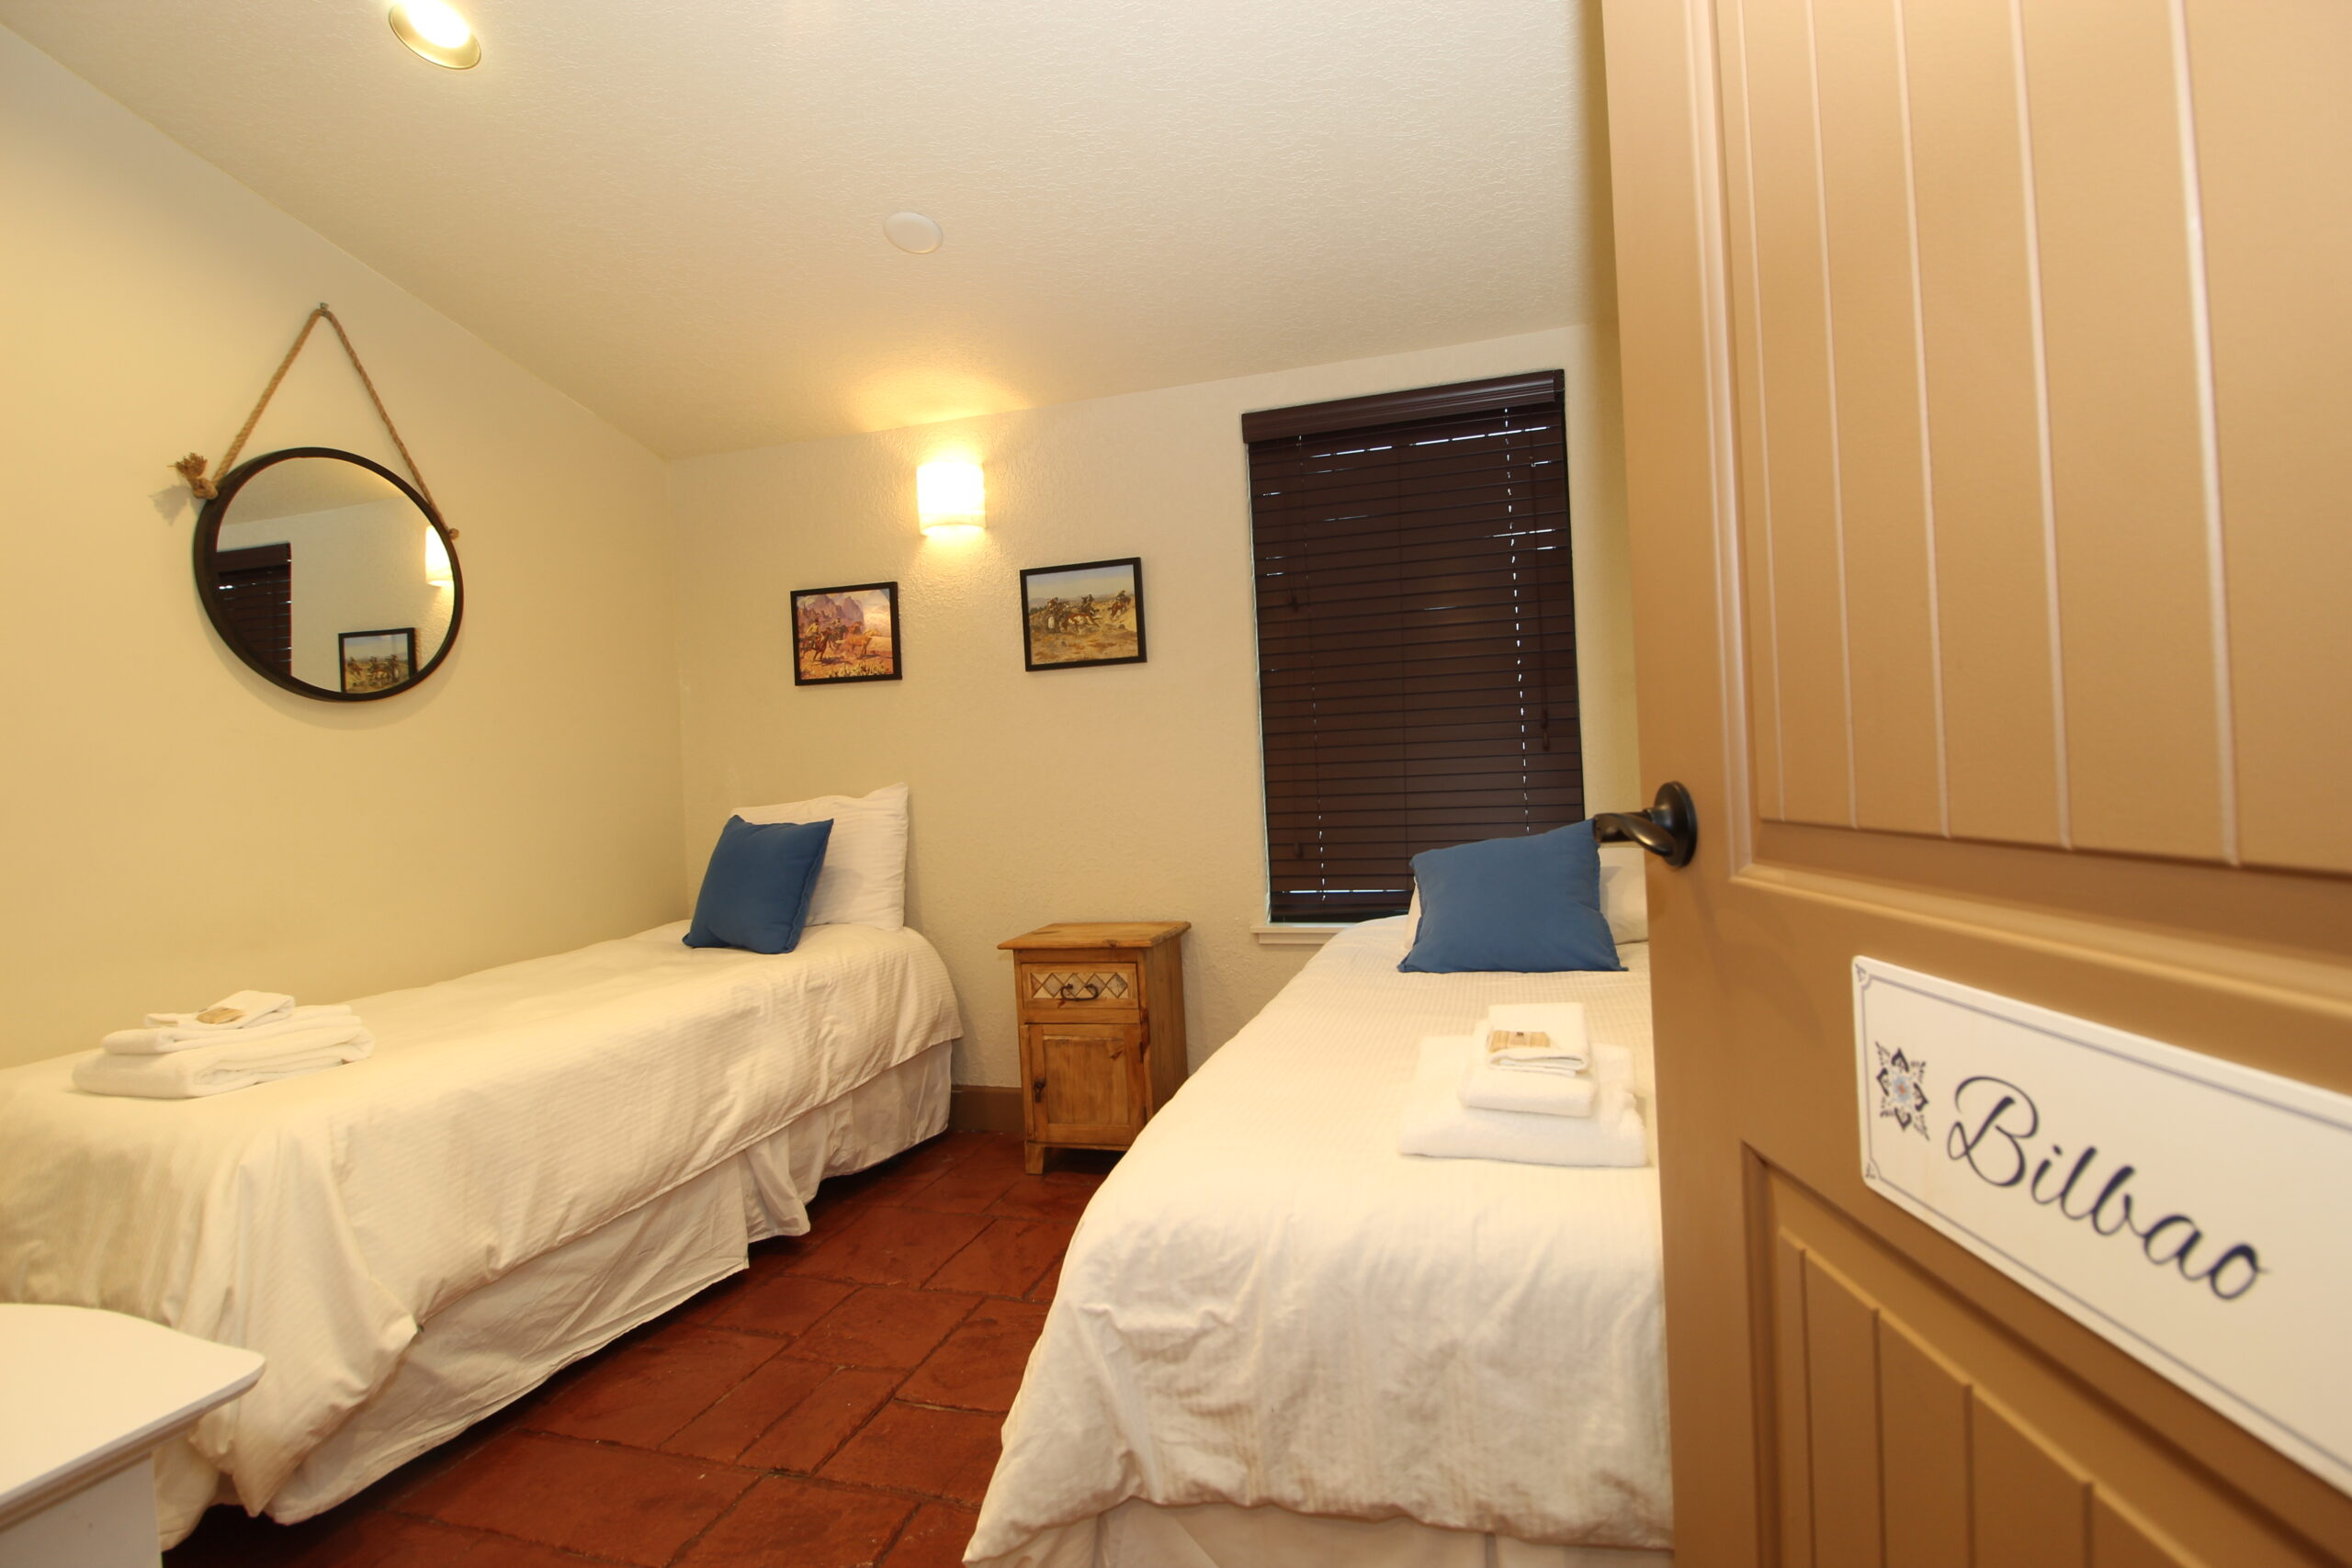 The Bilbao Room